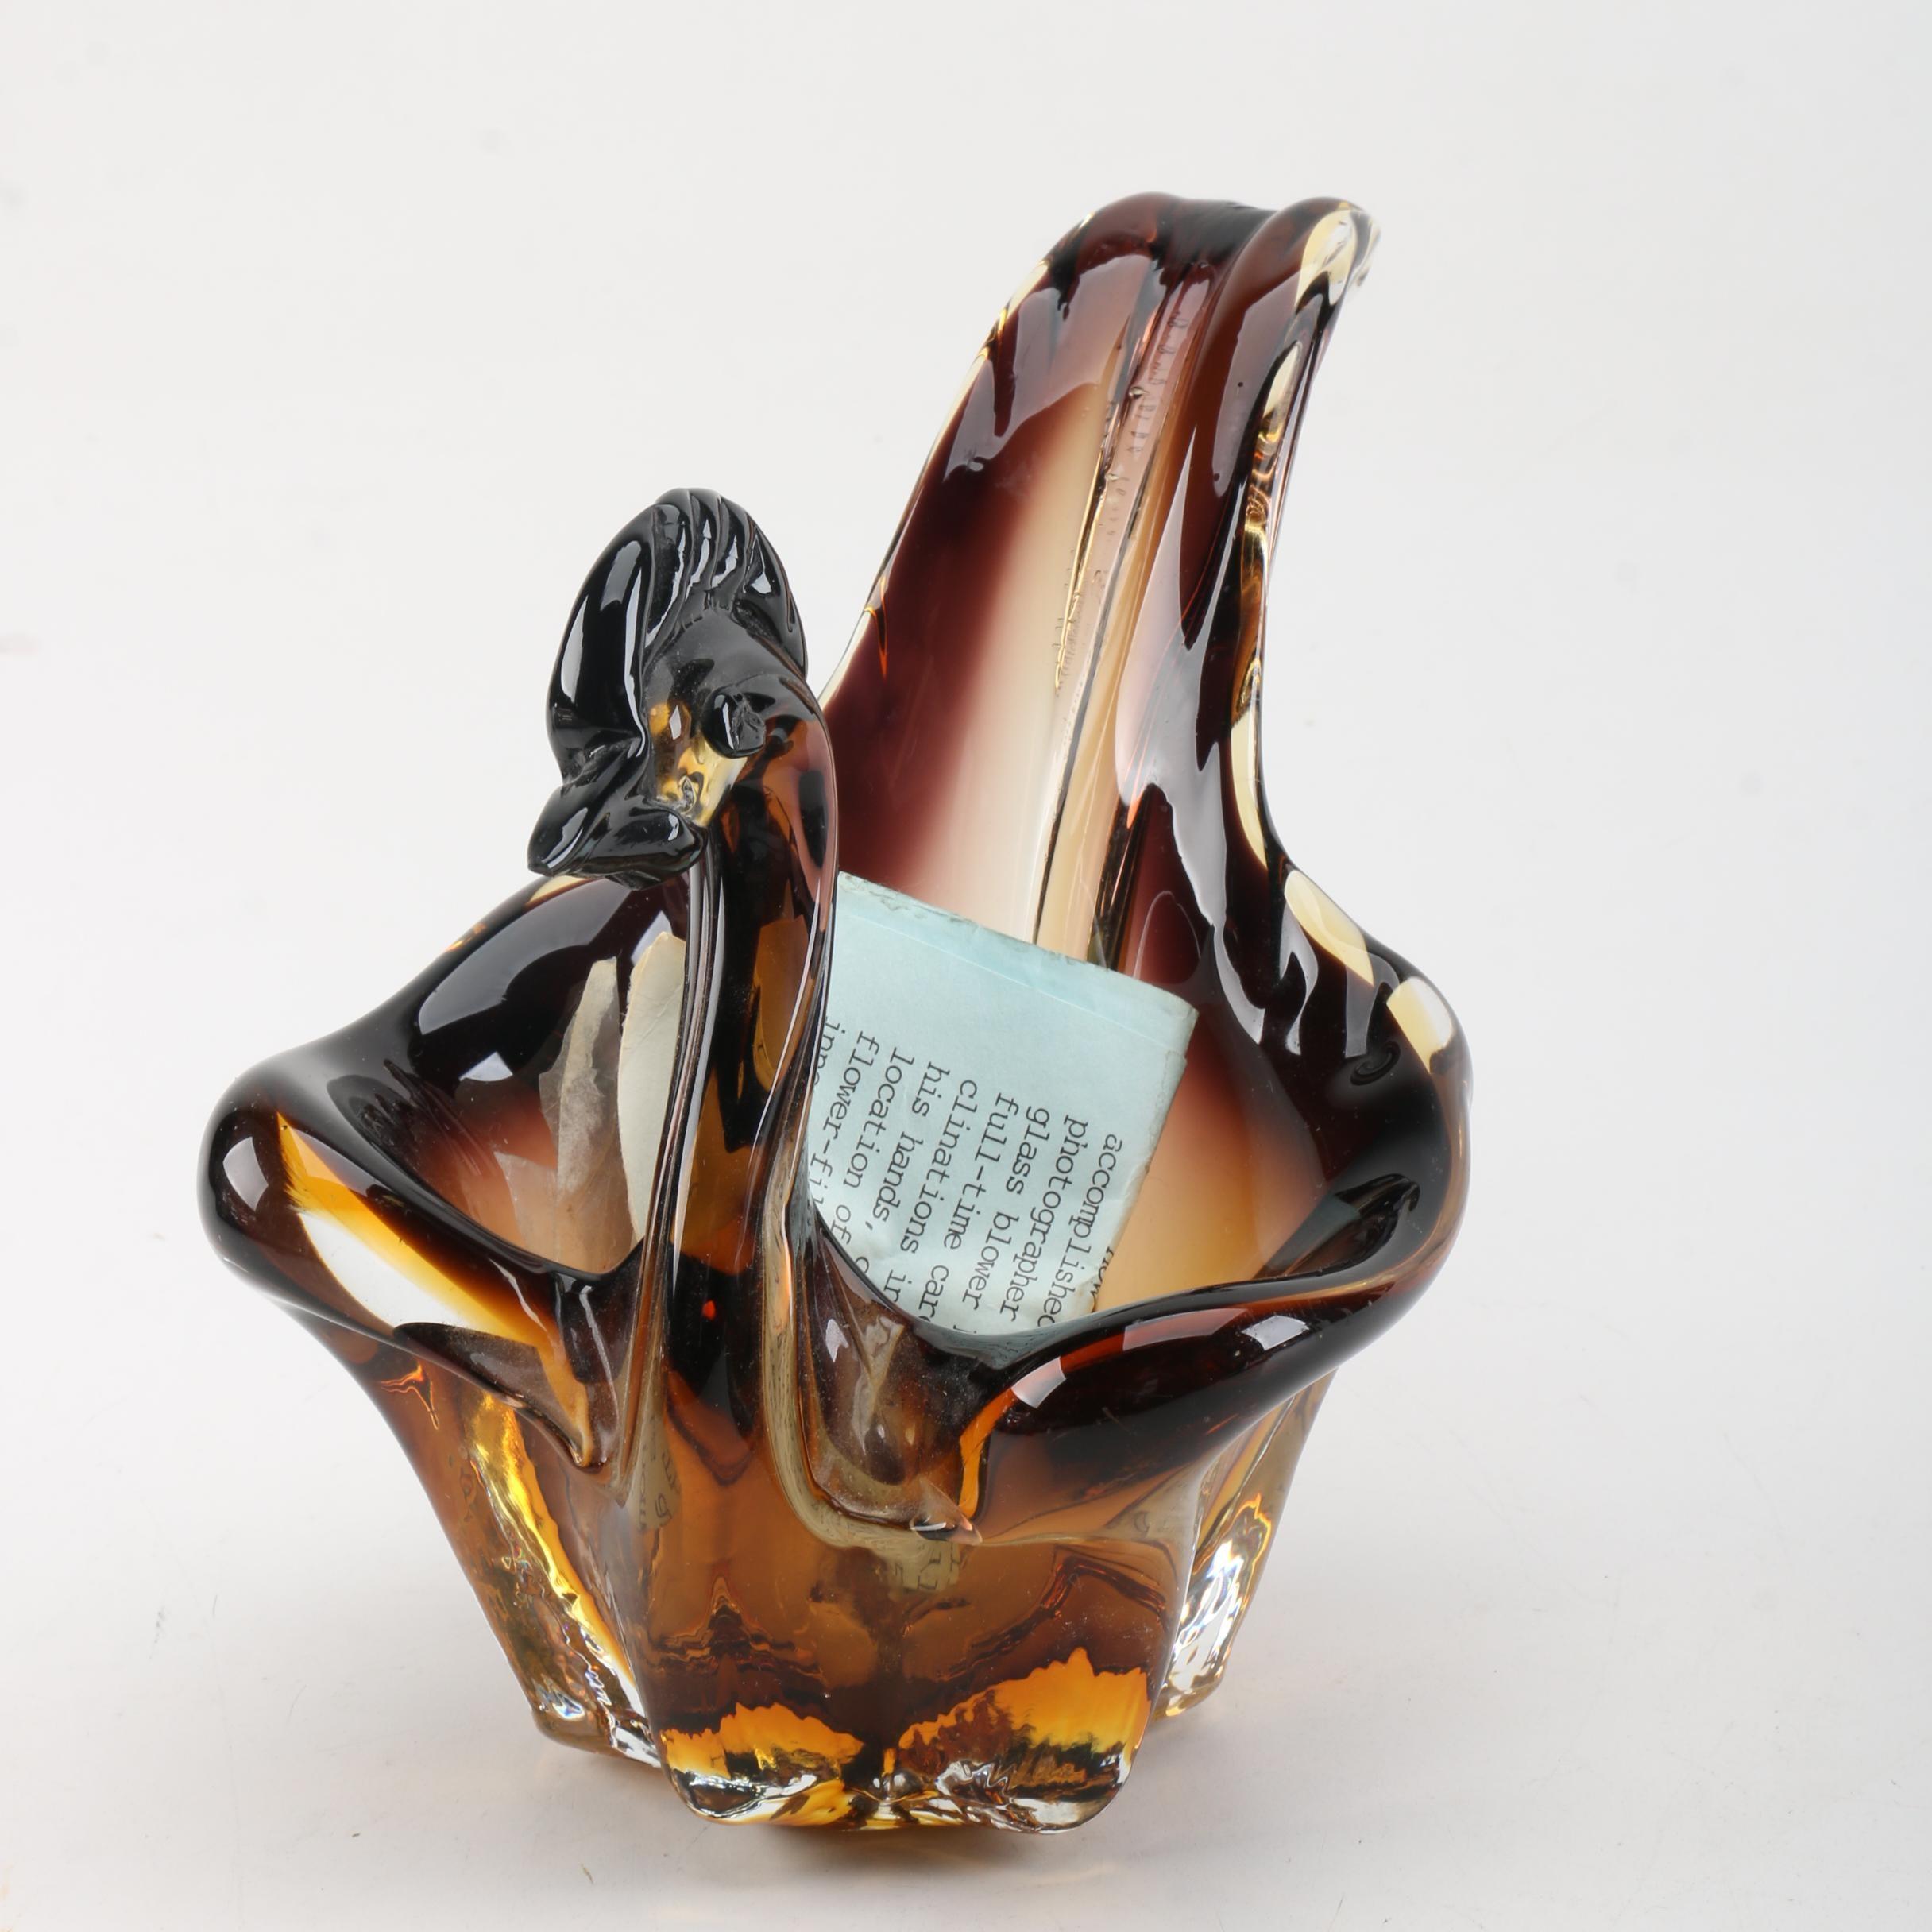 Art Glass Swan Figurine by Rollin Karg